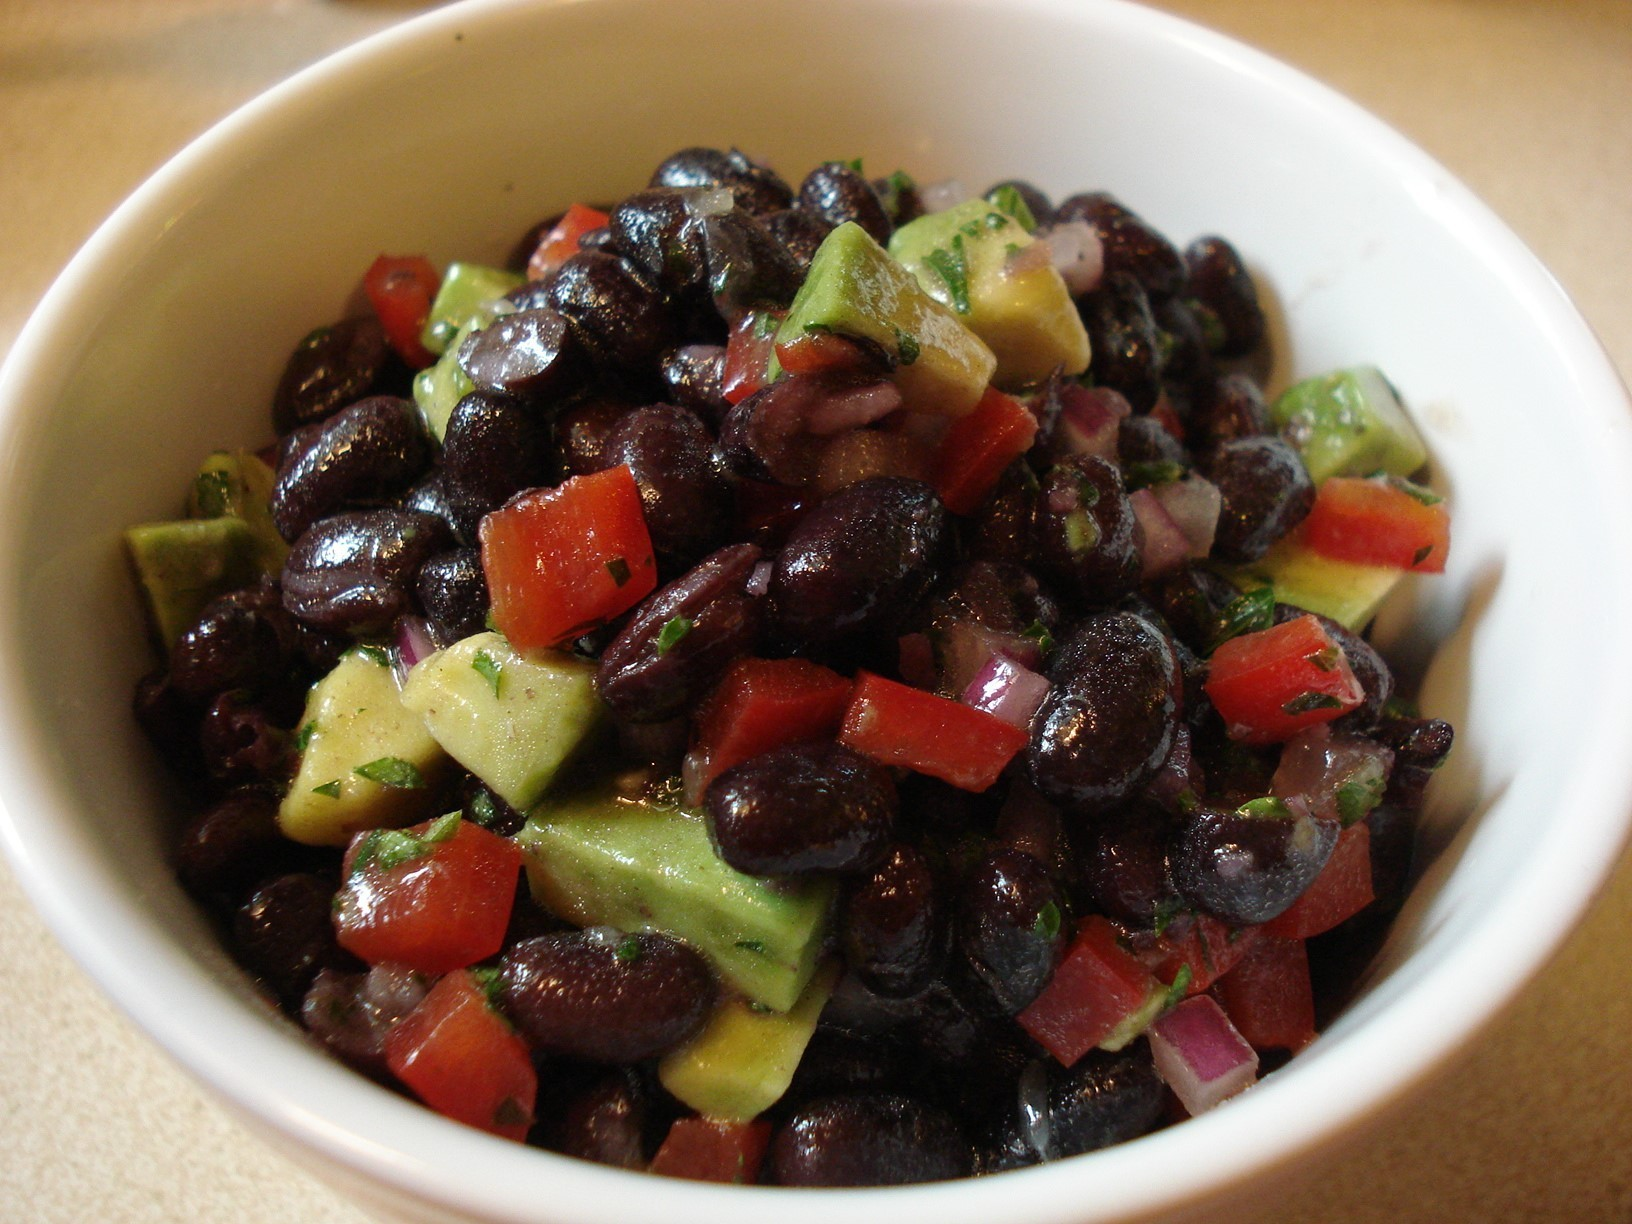 Black Bean Salad with Lime Vinaigrette